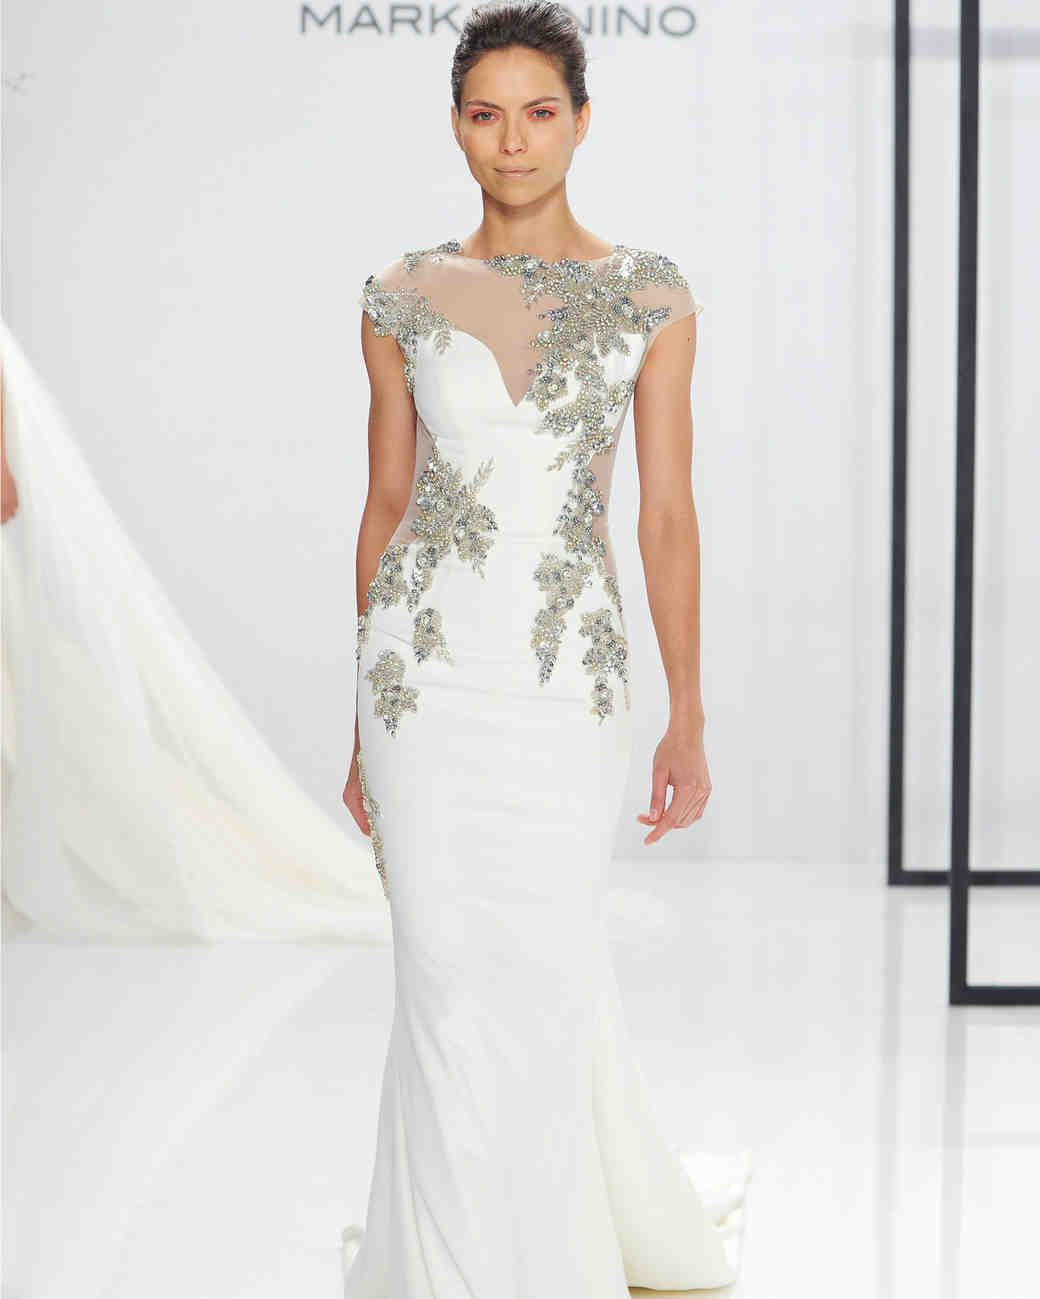 kleinfeld red wedding dress » Wedding Dresses Designs, Ideas and ...